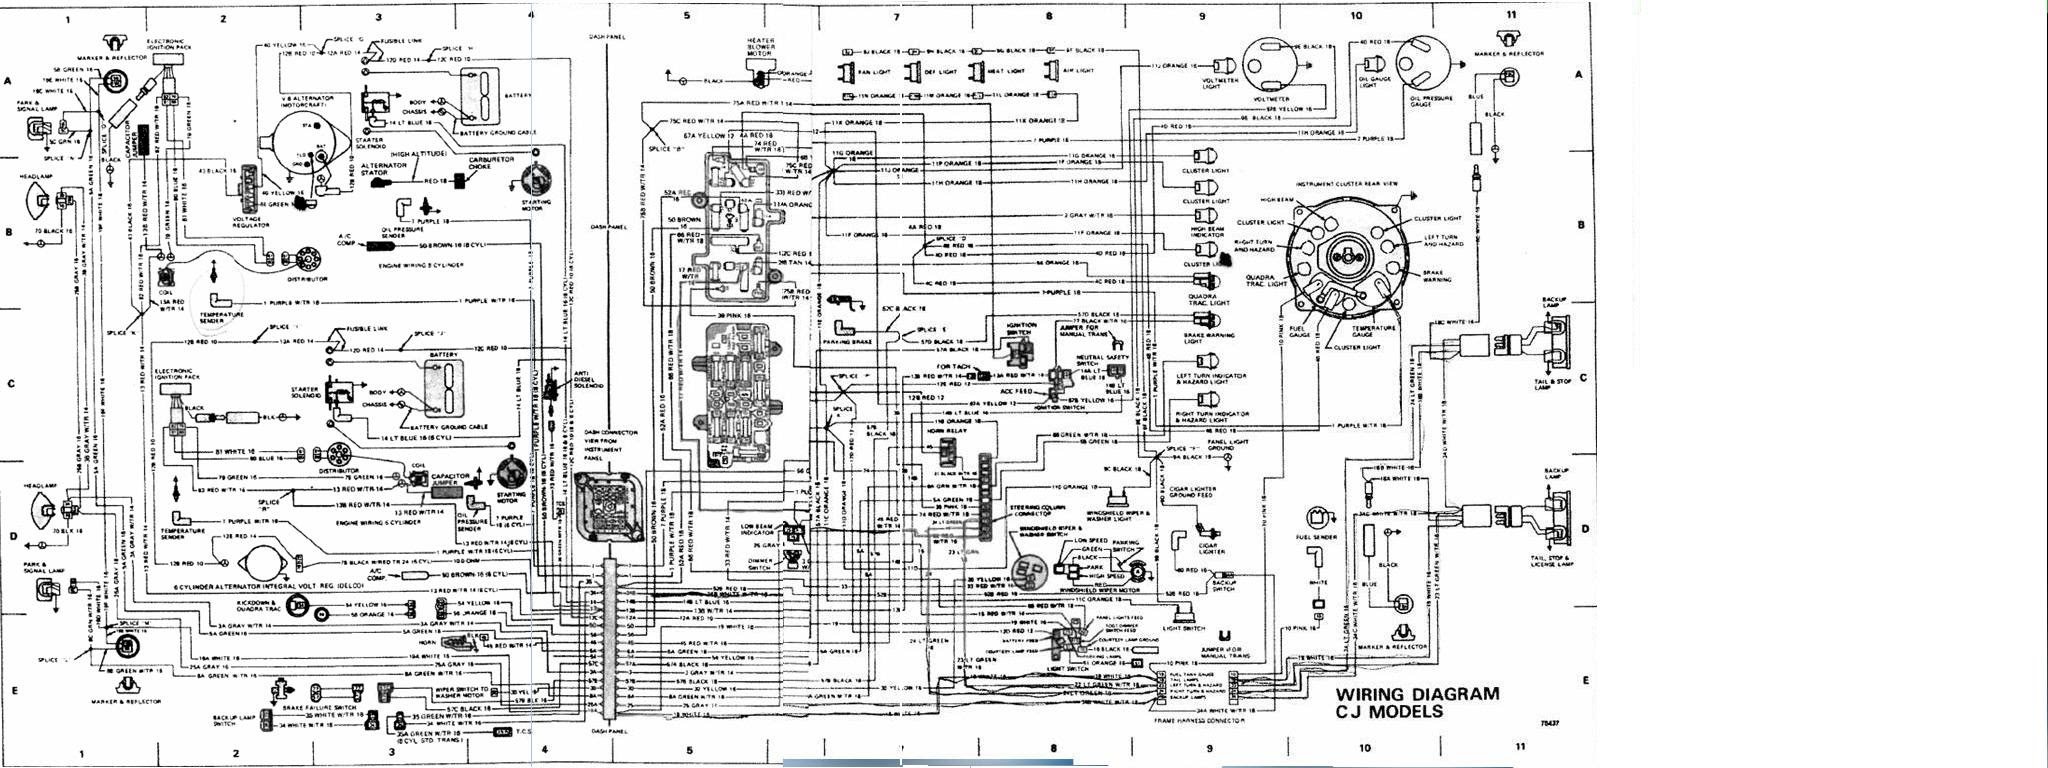 81 Jeep Cj7 Wiring Wiring Diagram Networks